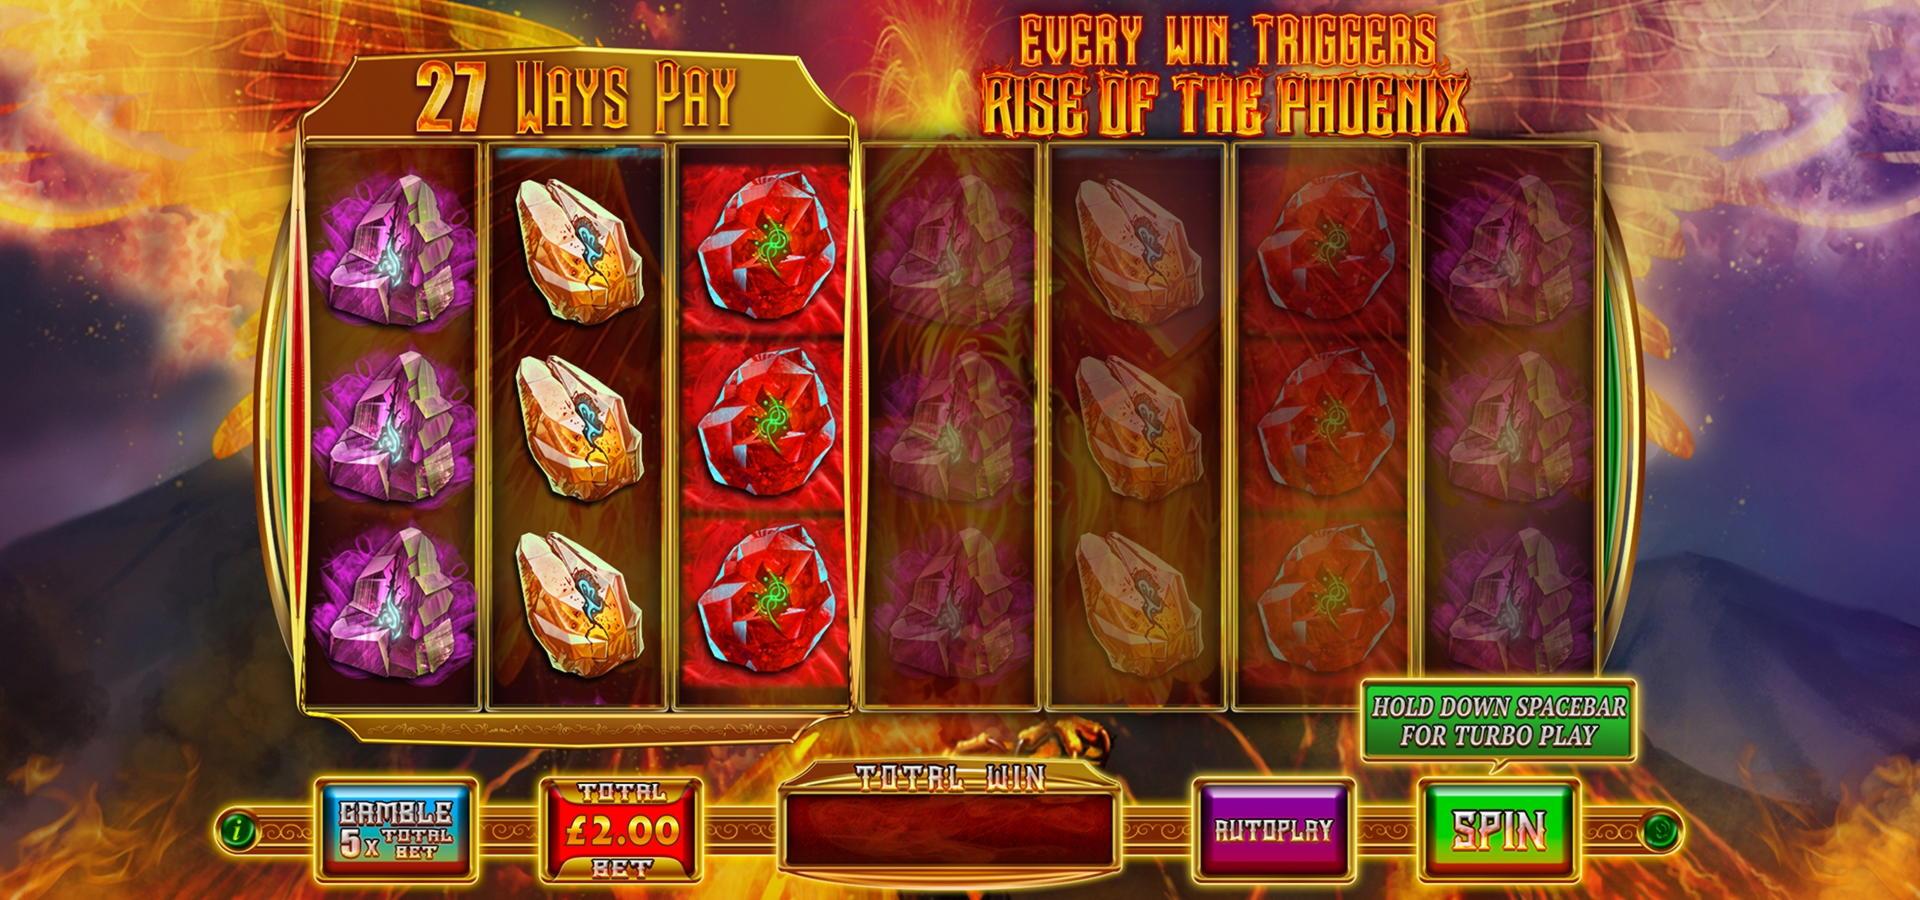 Każinò 33 jiddawwar fil-Fosino Casino